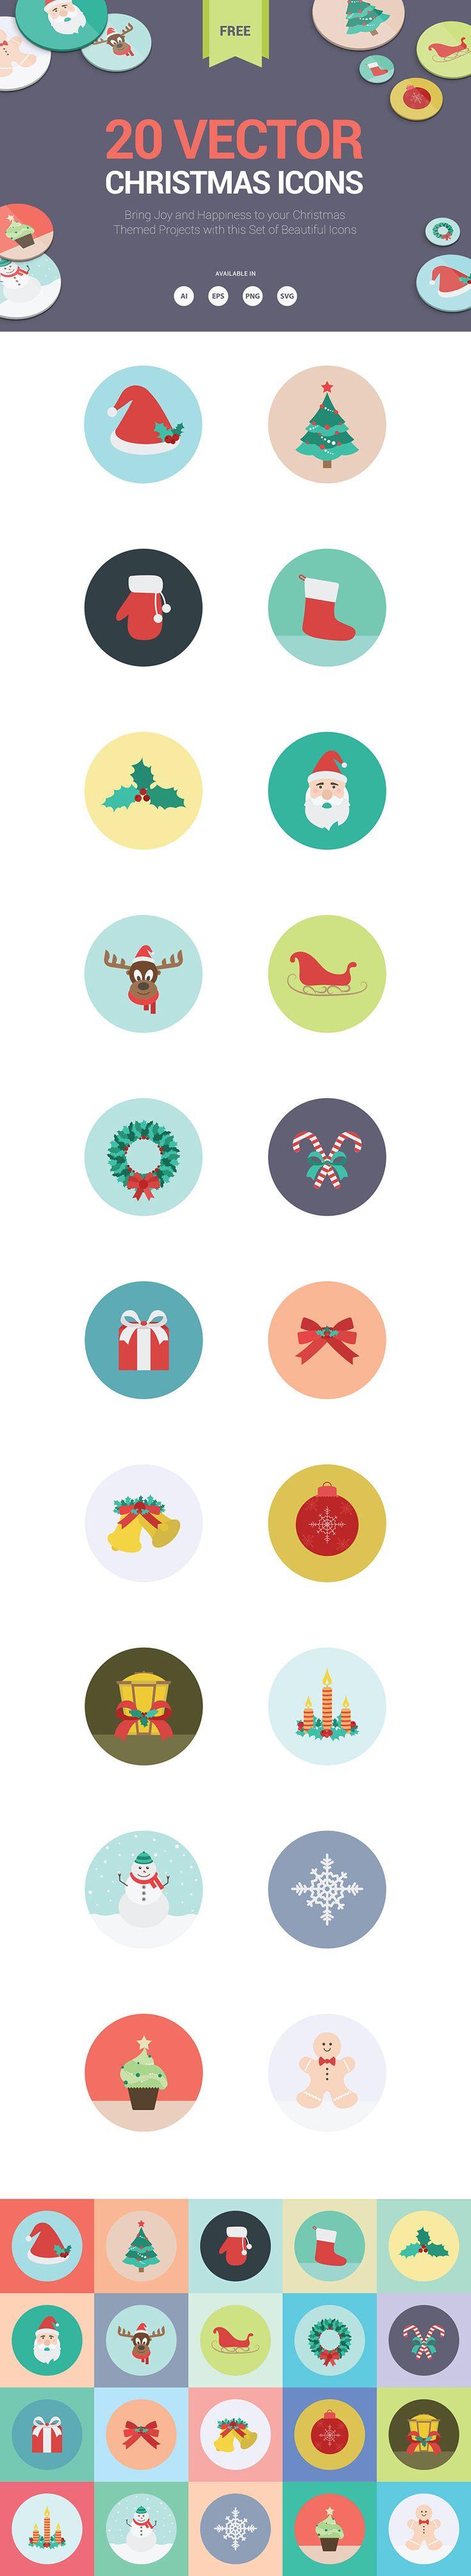 20 free christmas icons set ai eps svg png basic icons flat icons 1000